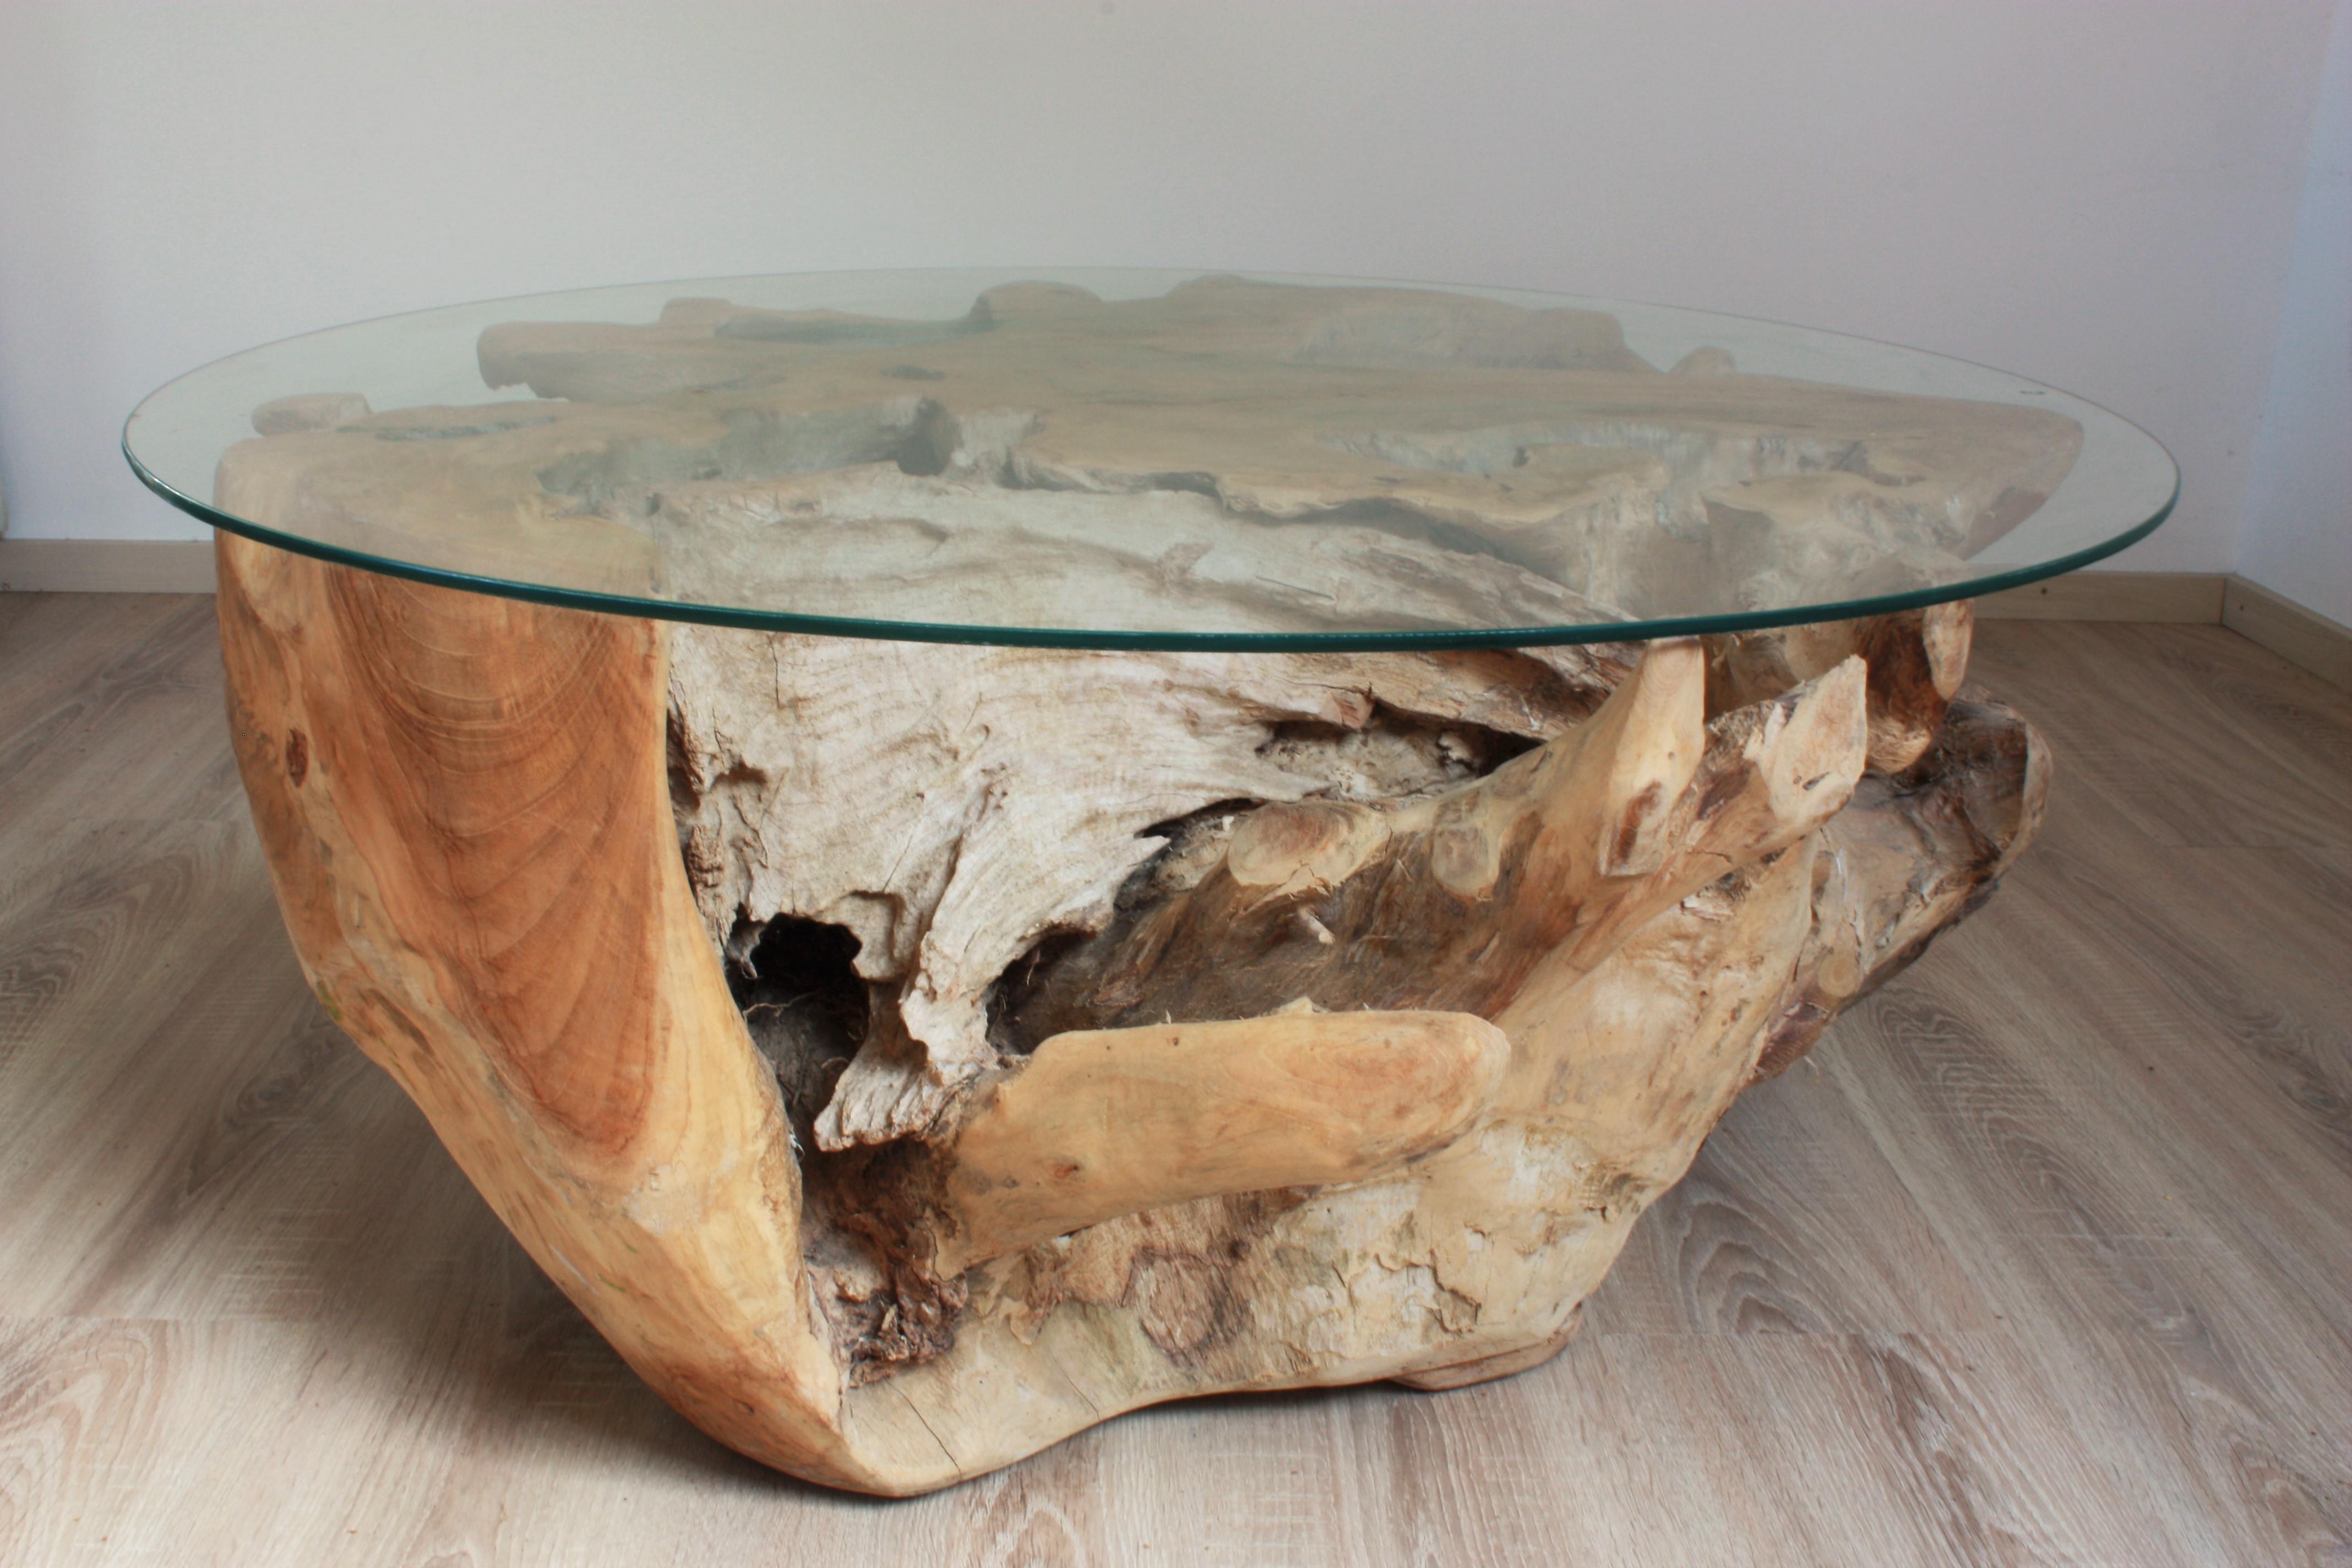 couchtisch wurzelholz holz rustikal beistelltisch. Black Bedroom Furniture Sets. Home Design Ideas